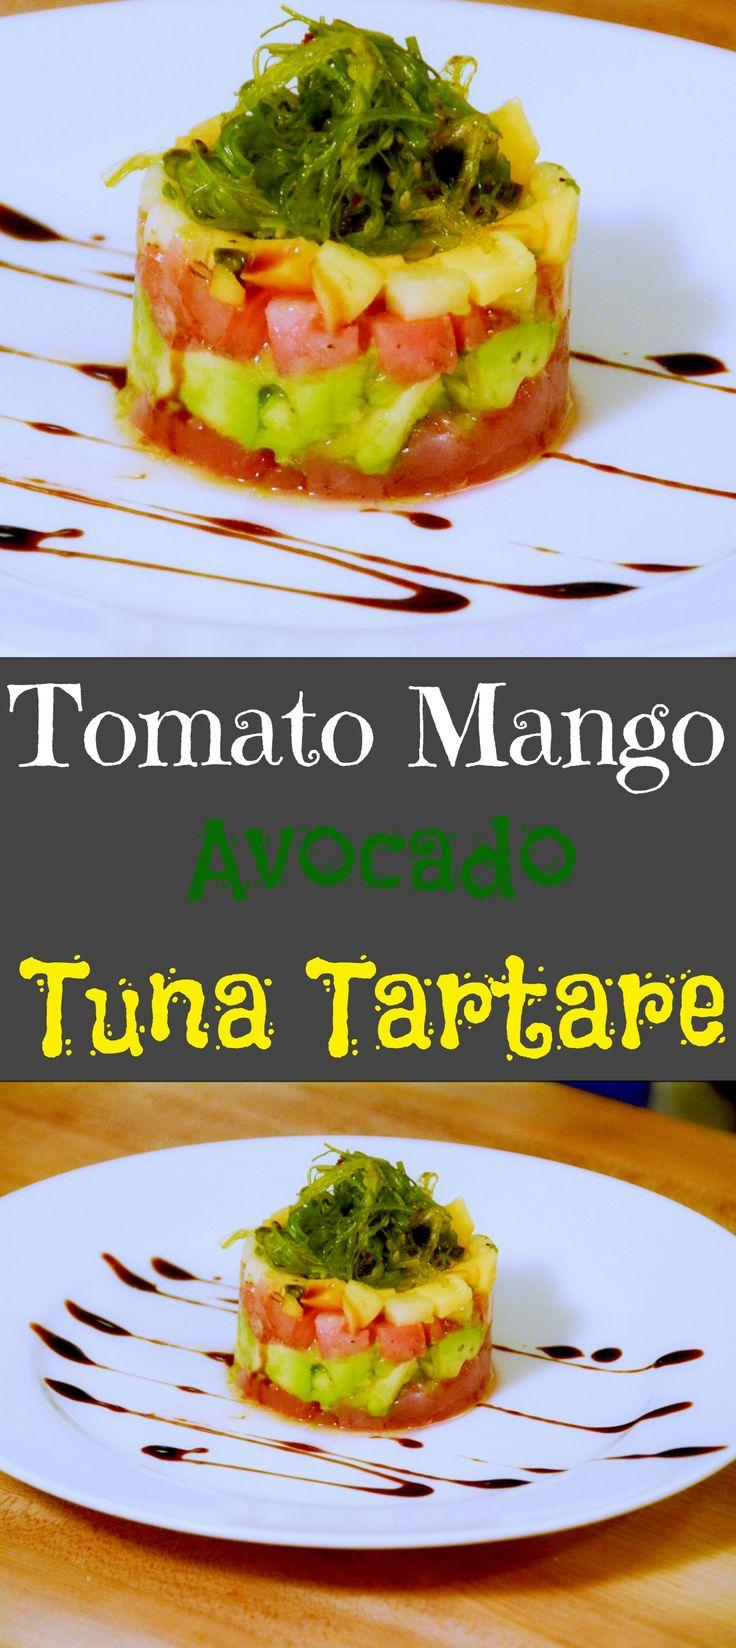 Tomato Mango Avacado Tuna Tartare